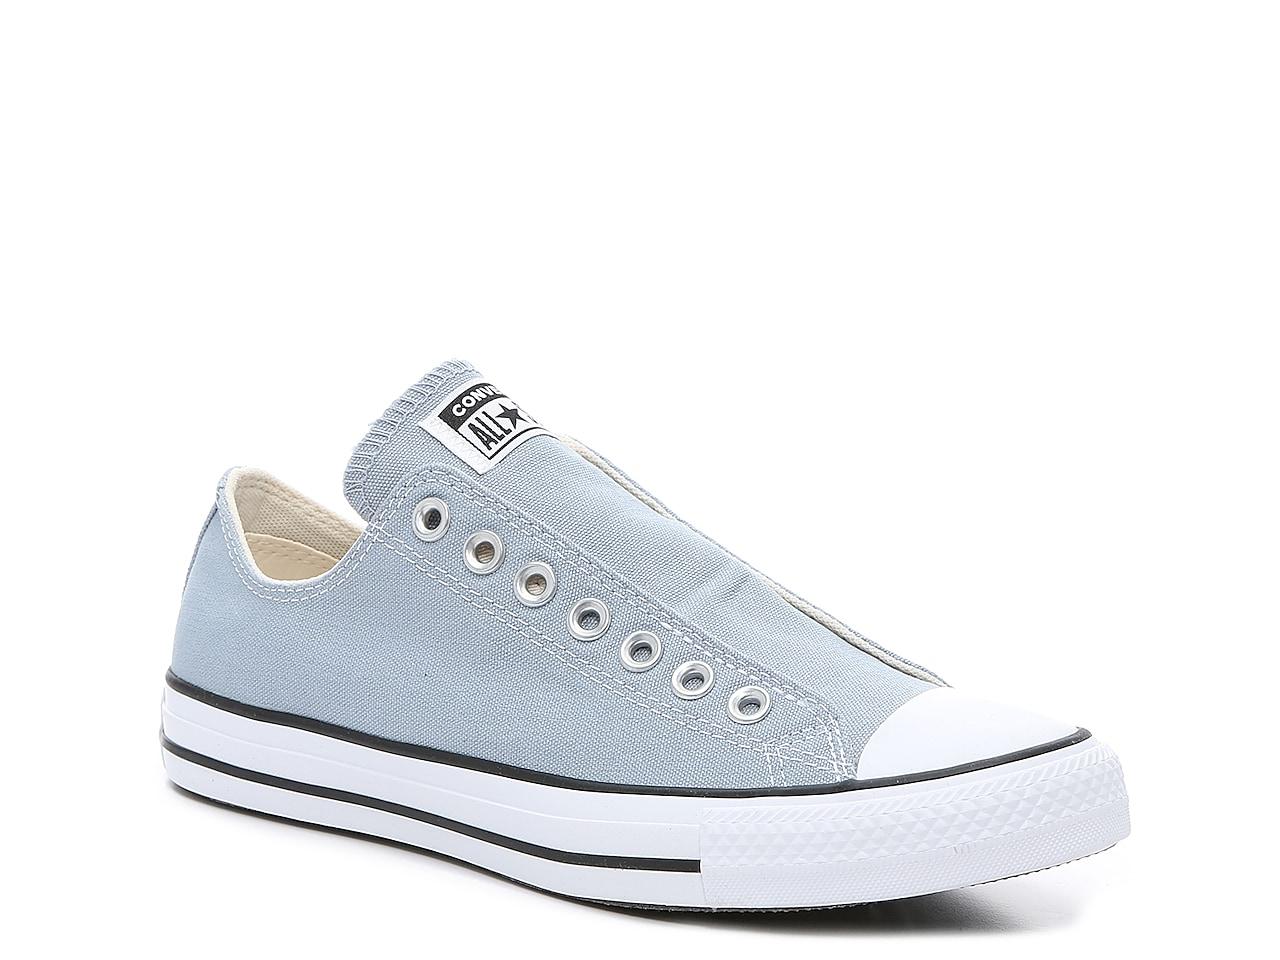 Chuck Taylor All Star Slip-On Sneaker - Women's